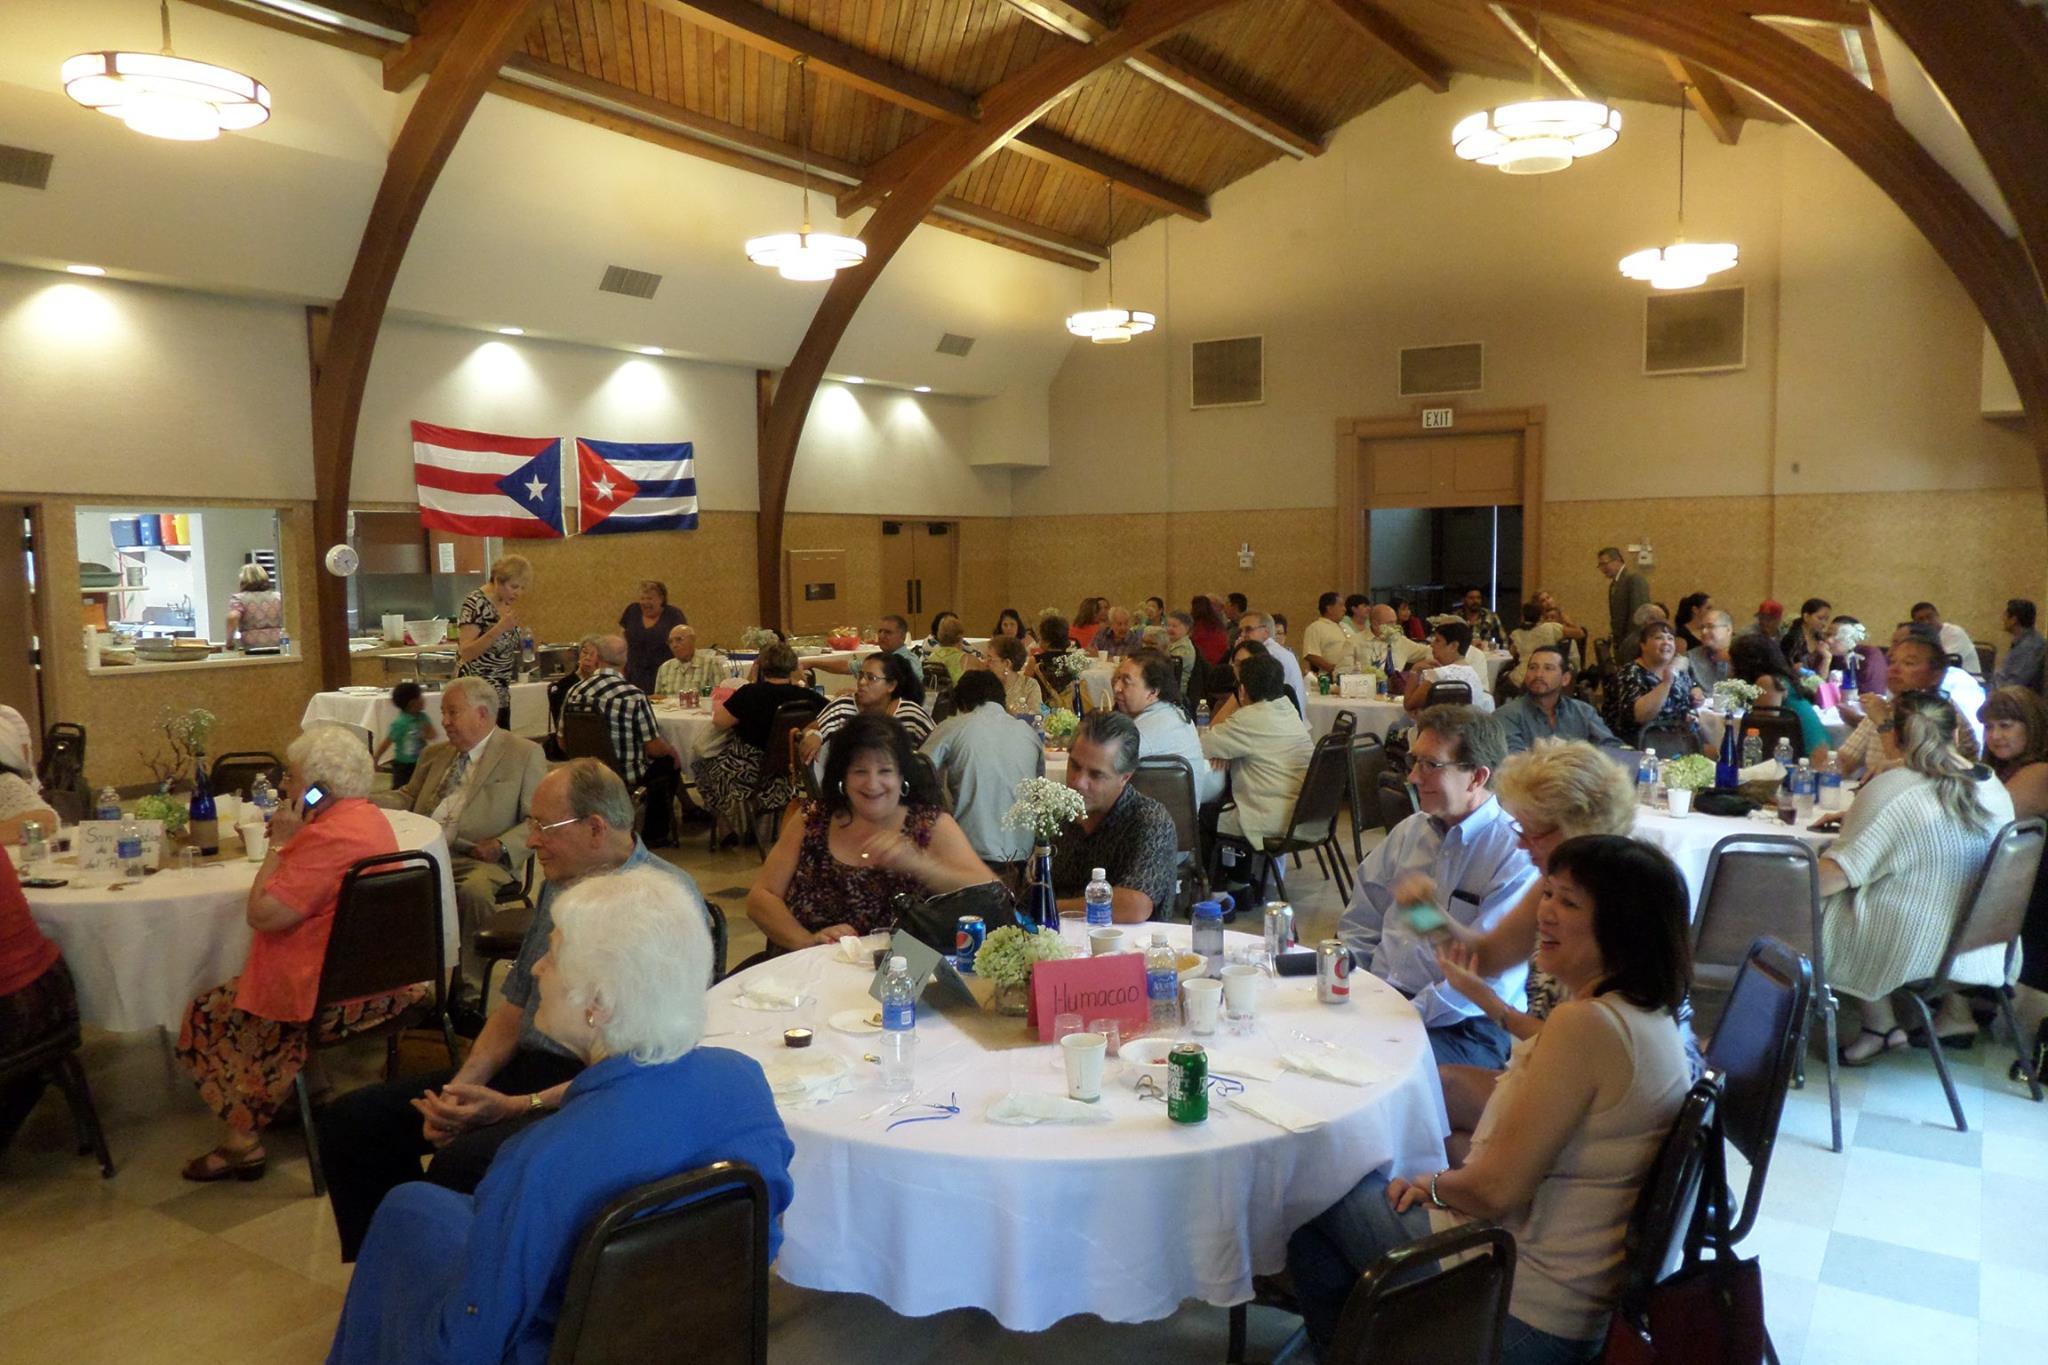 claremont-presbyterian-church-event-fellowship-hall-2.jpg